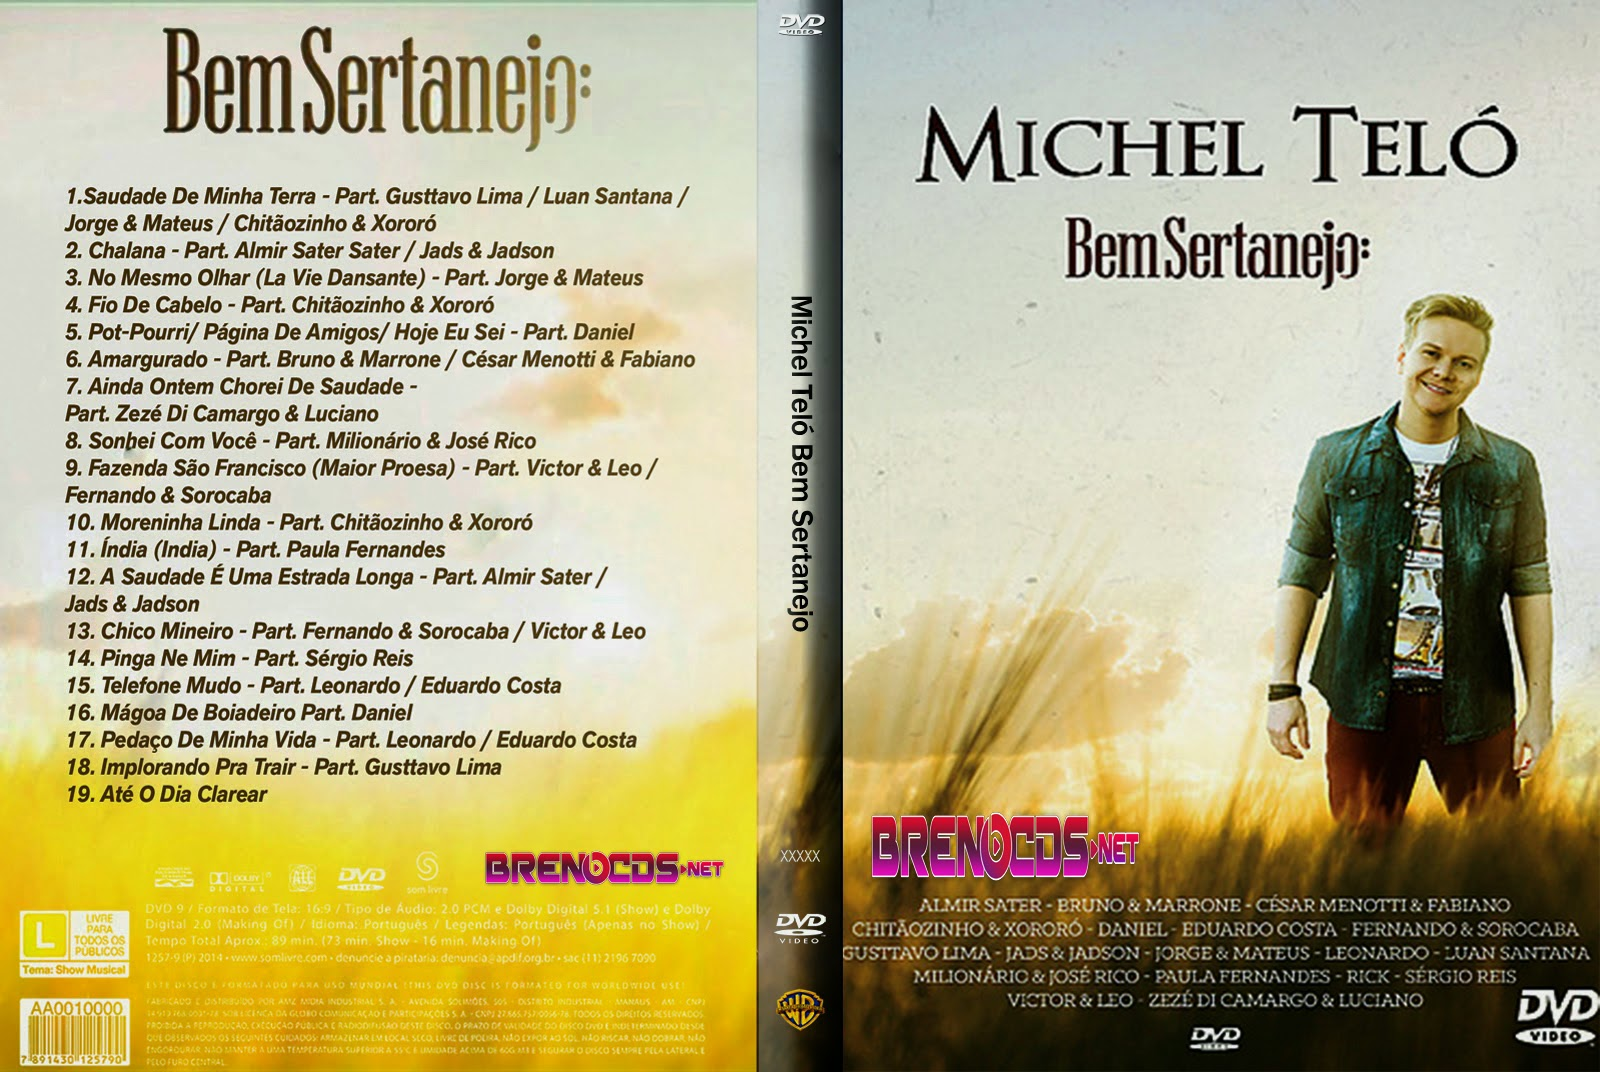 baixar dvd michel tel bem sertanejo via torrent